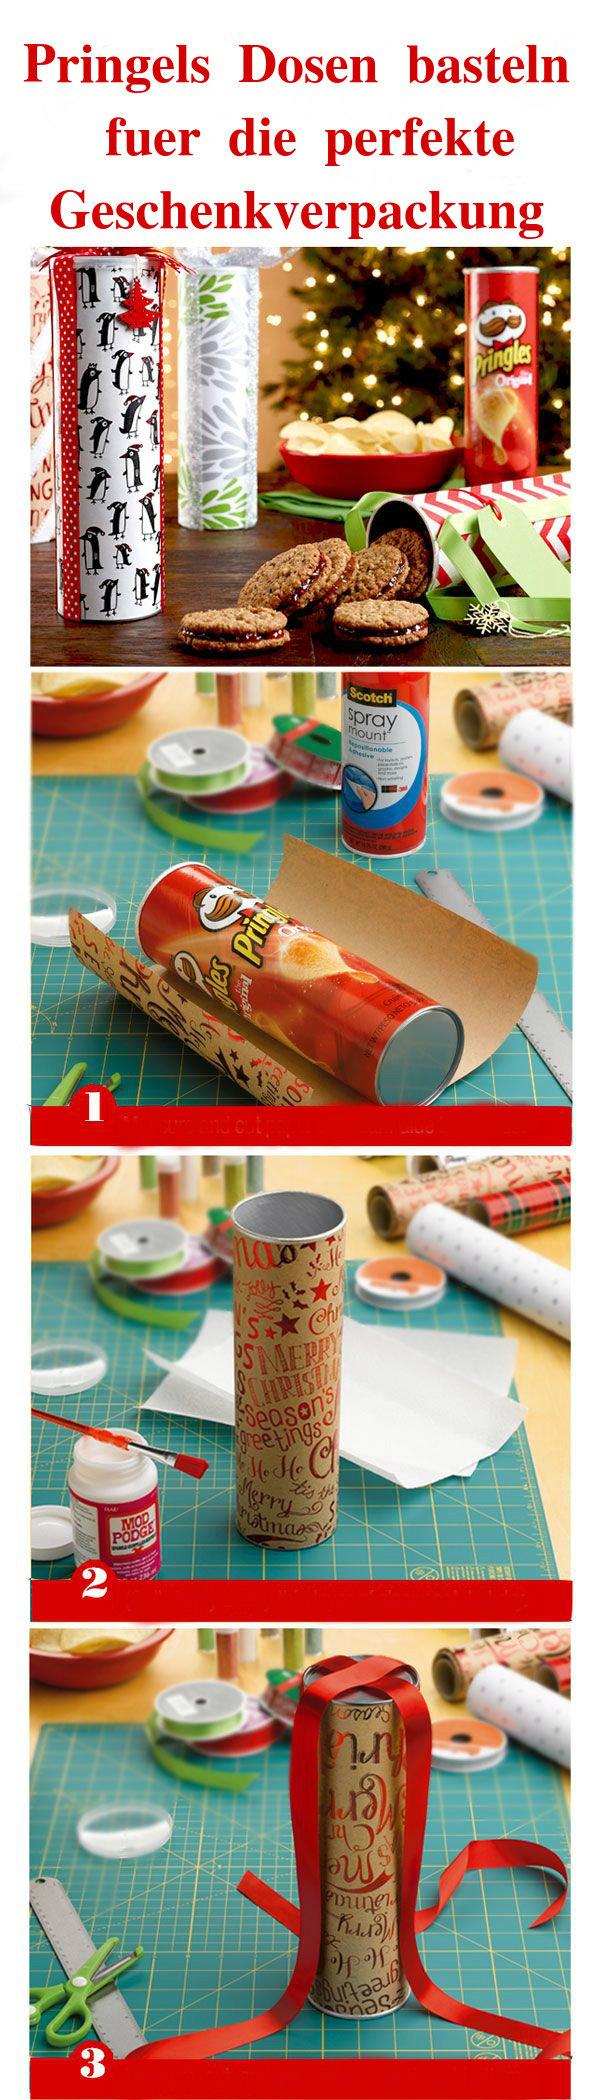 Pringles Dosen Basteln 101 Diy Ideen Zum Selbermachen